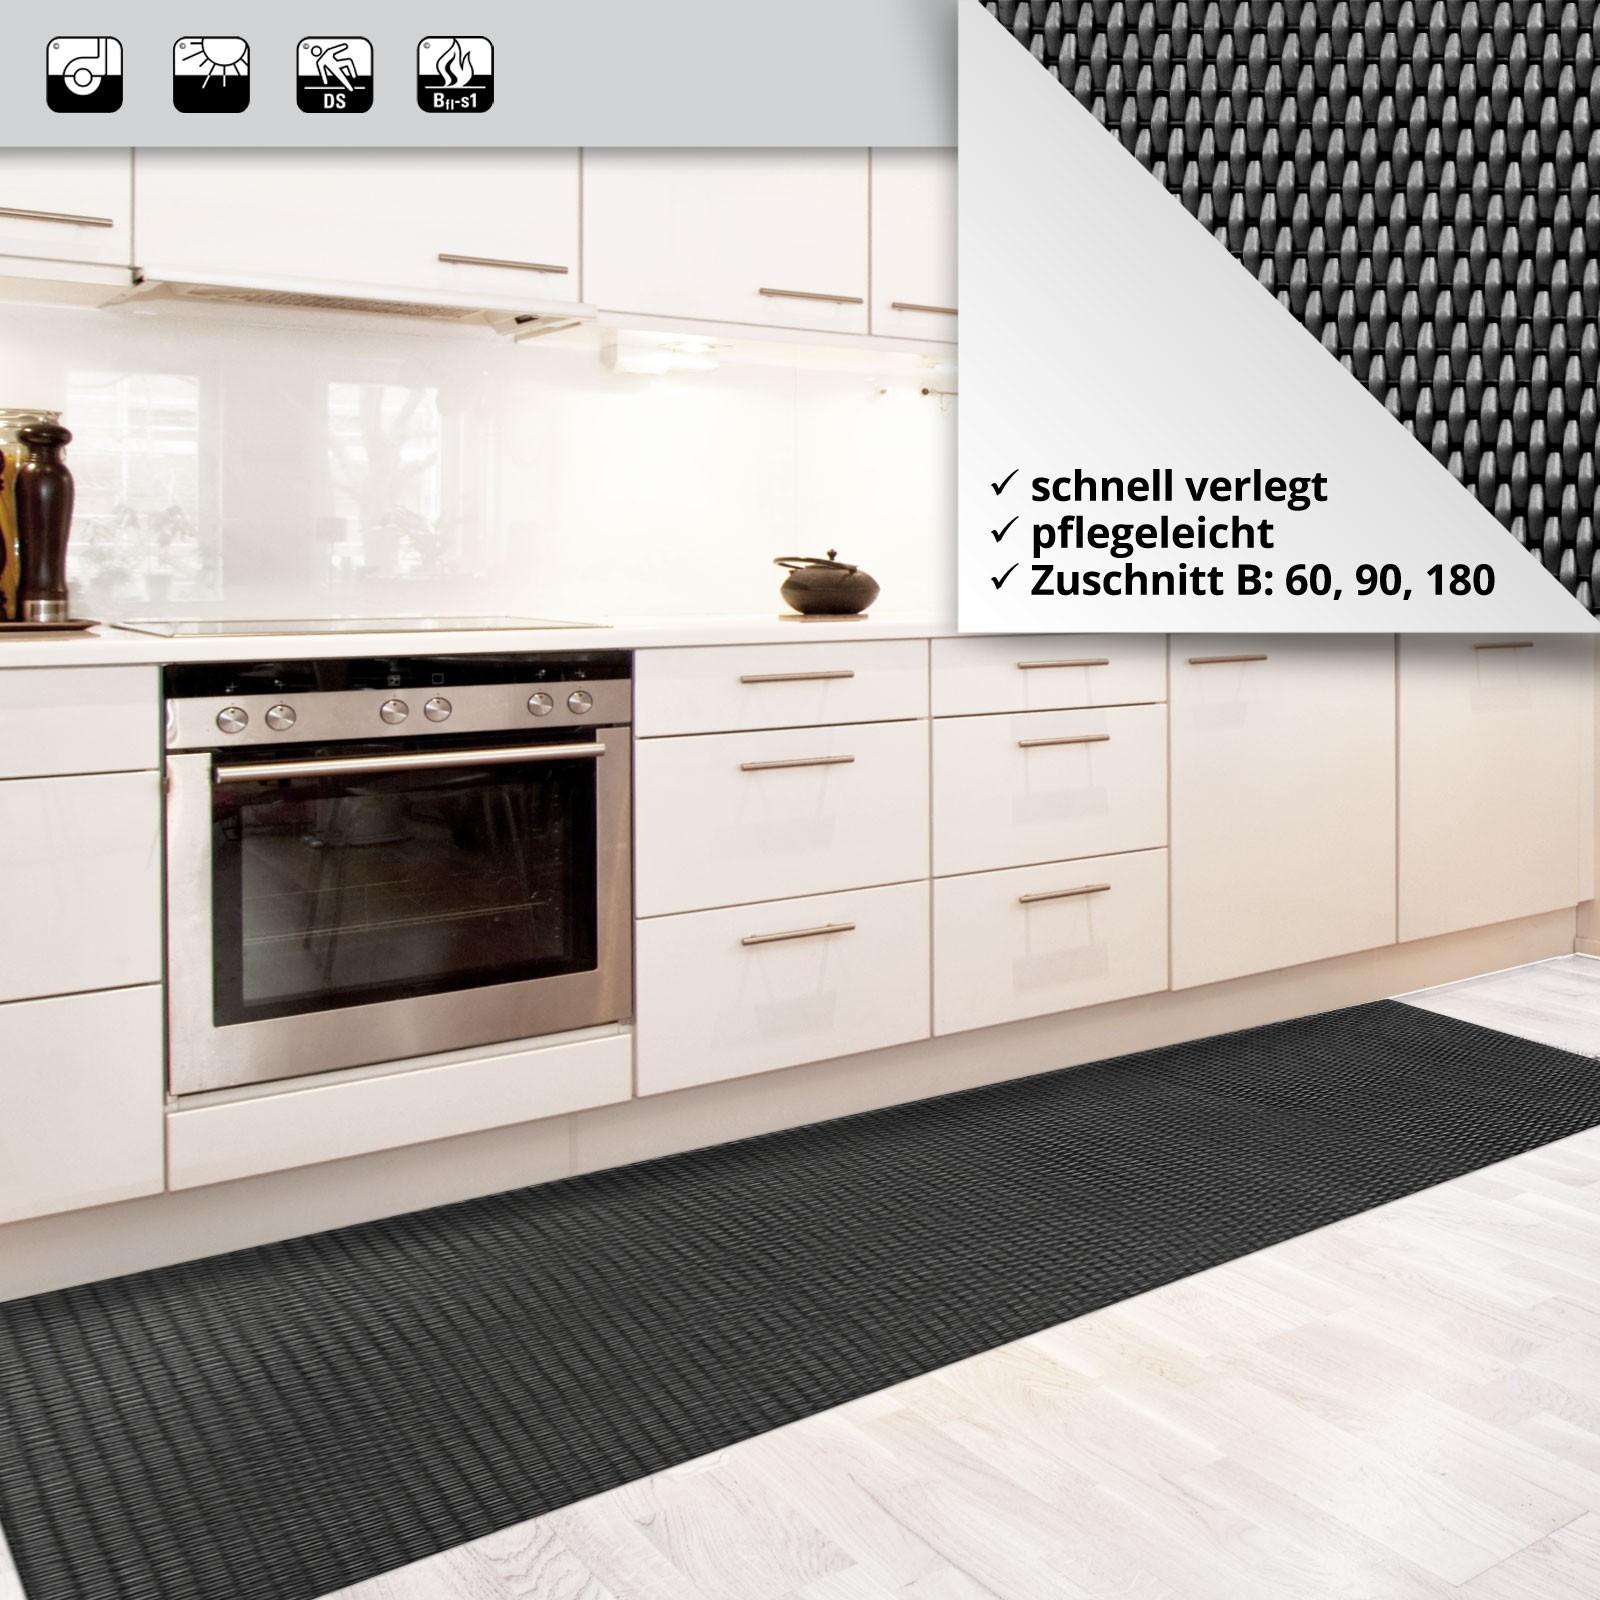 Full Size of Kunststoff Teppich Küche Outdoor Teppich Küche Teppich Küche Skandinavisch Teppich Küche Fliesenoptik Küche Teppich Küche